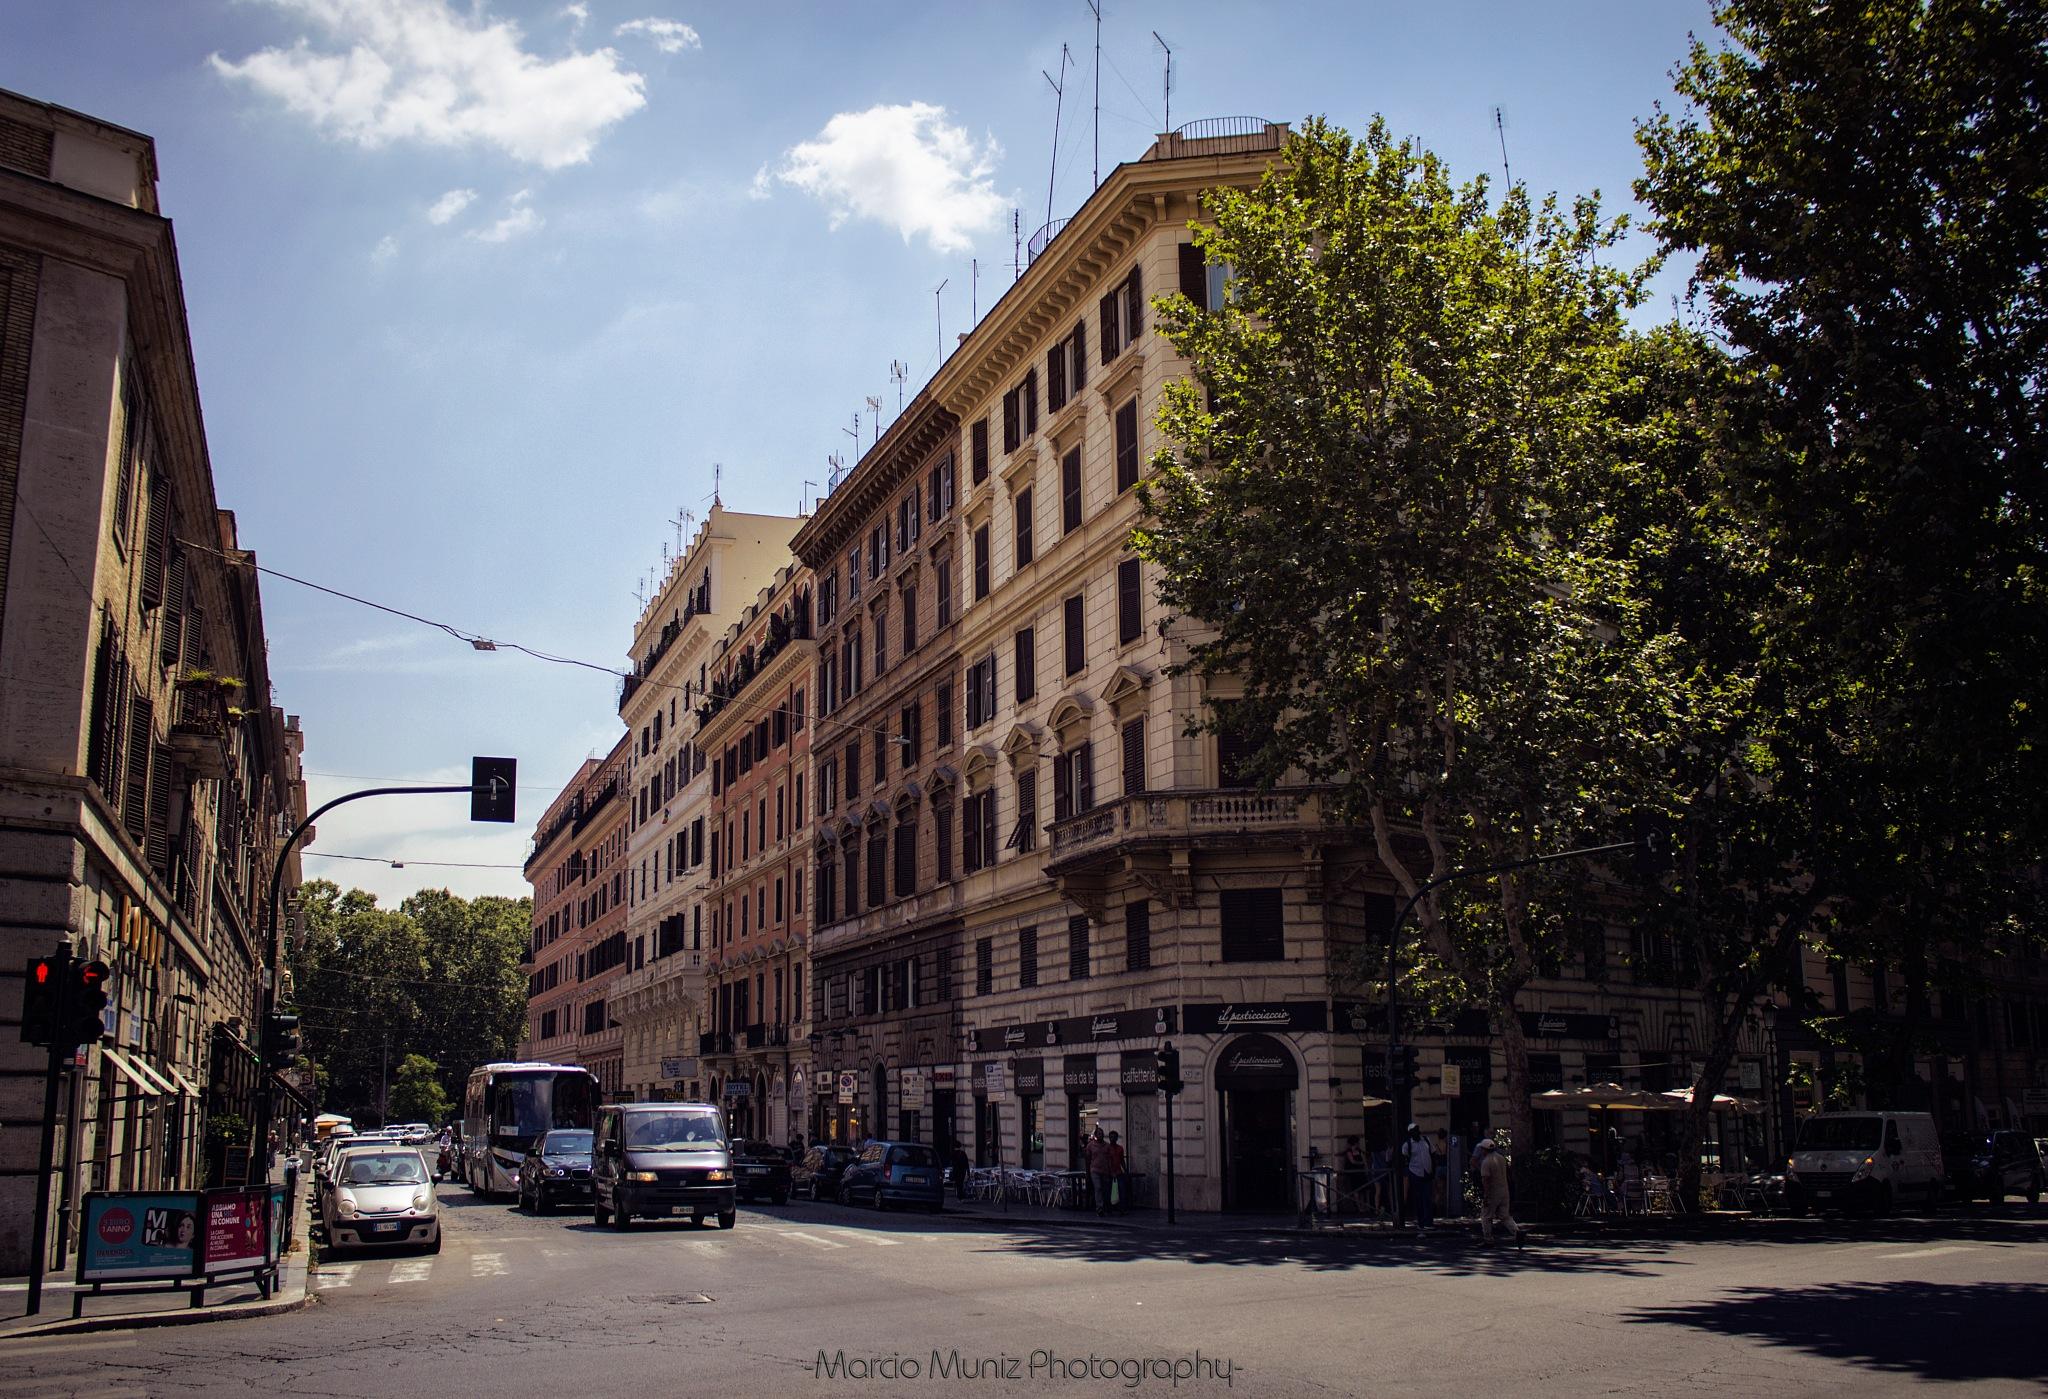 Streets of Roma by Marcio Muniz